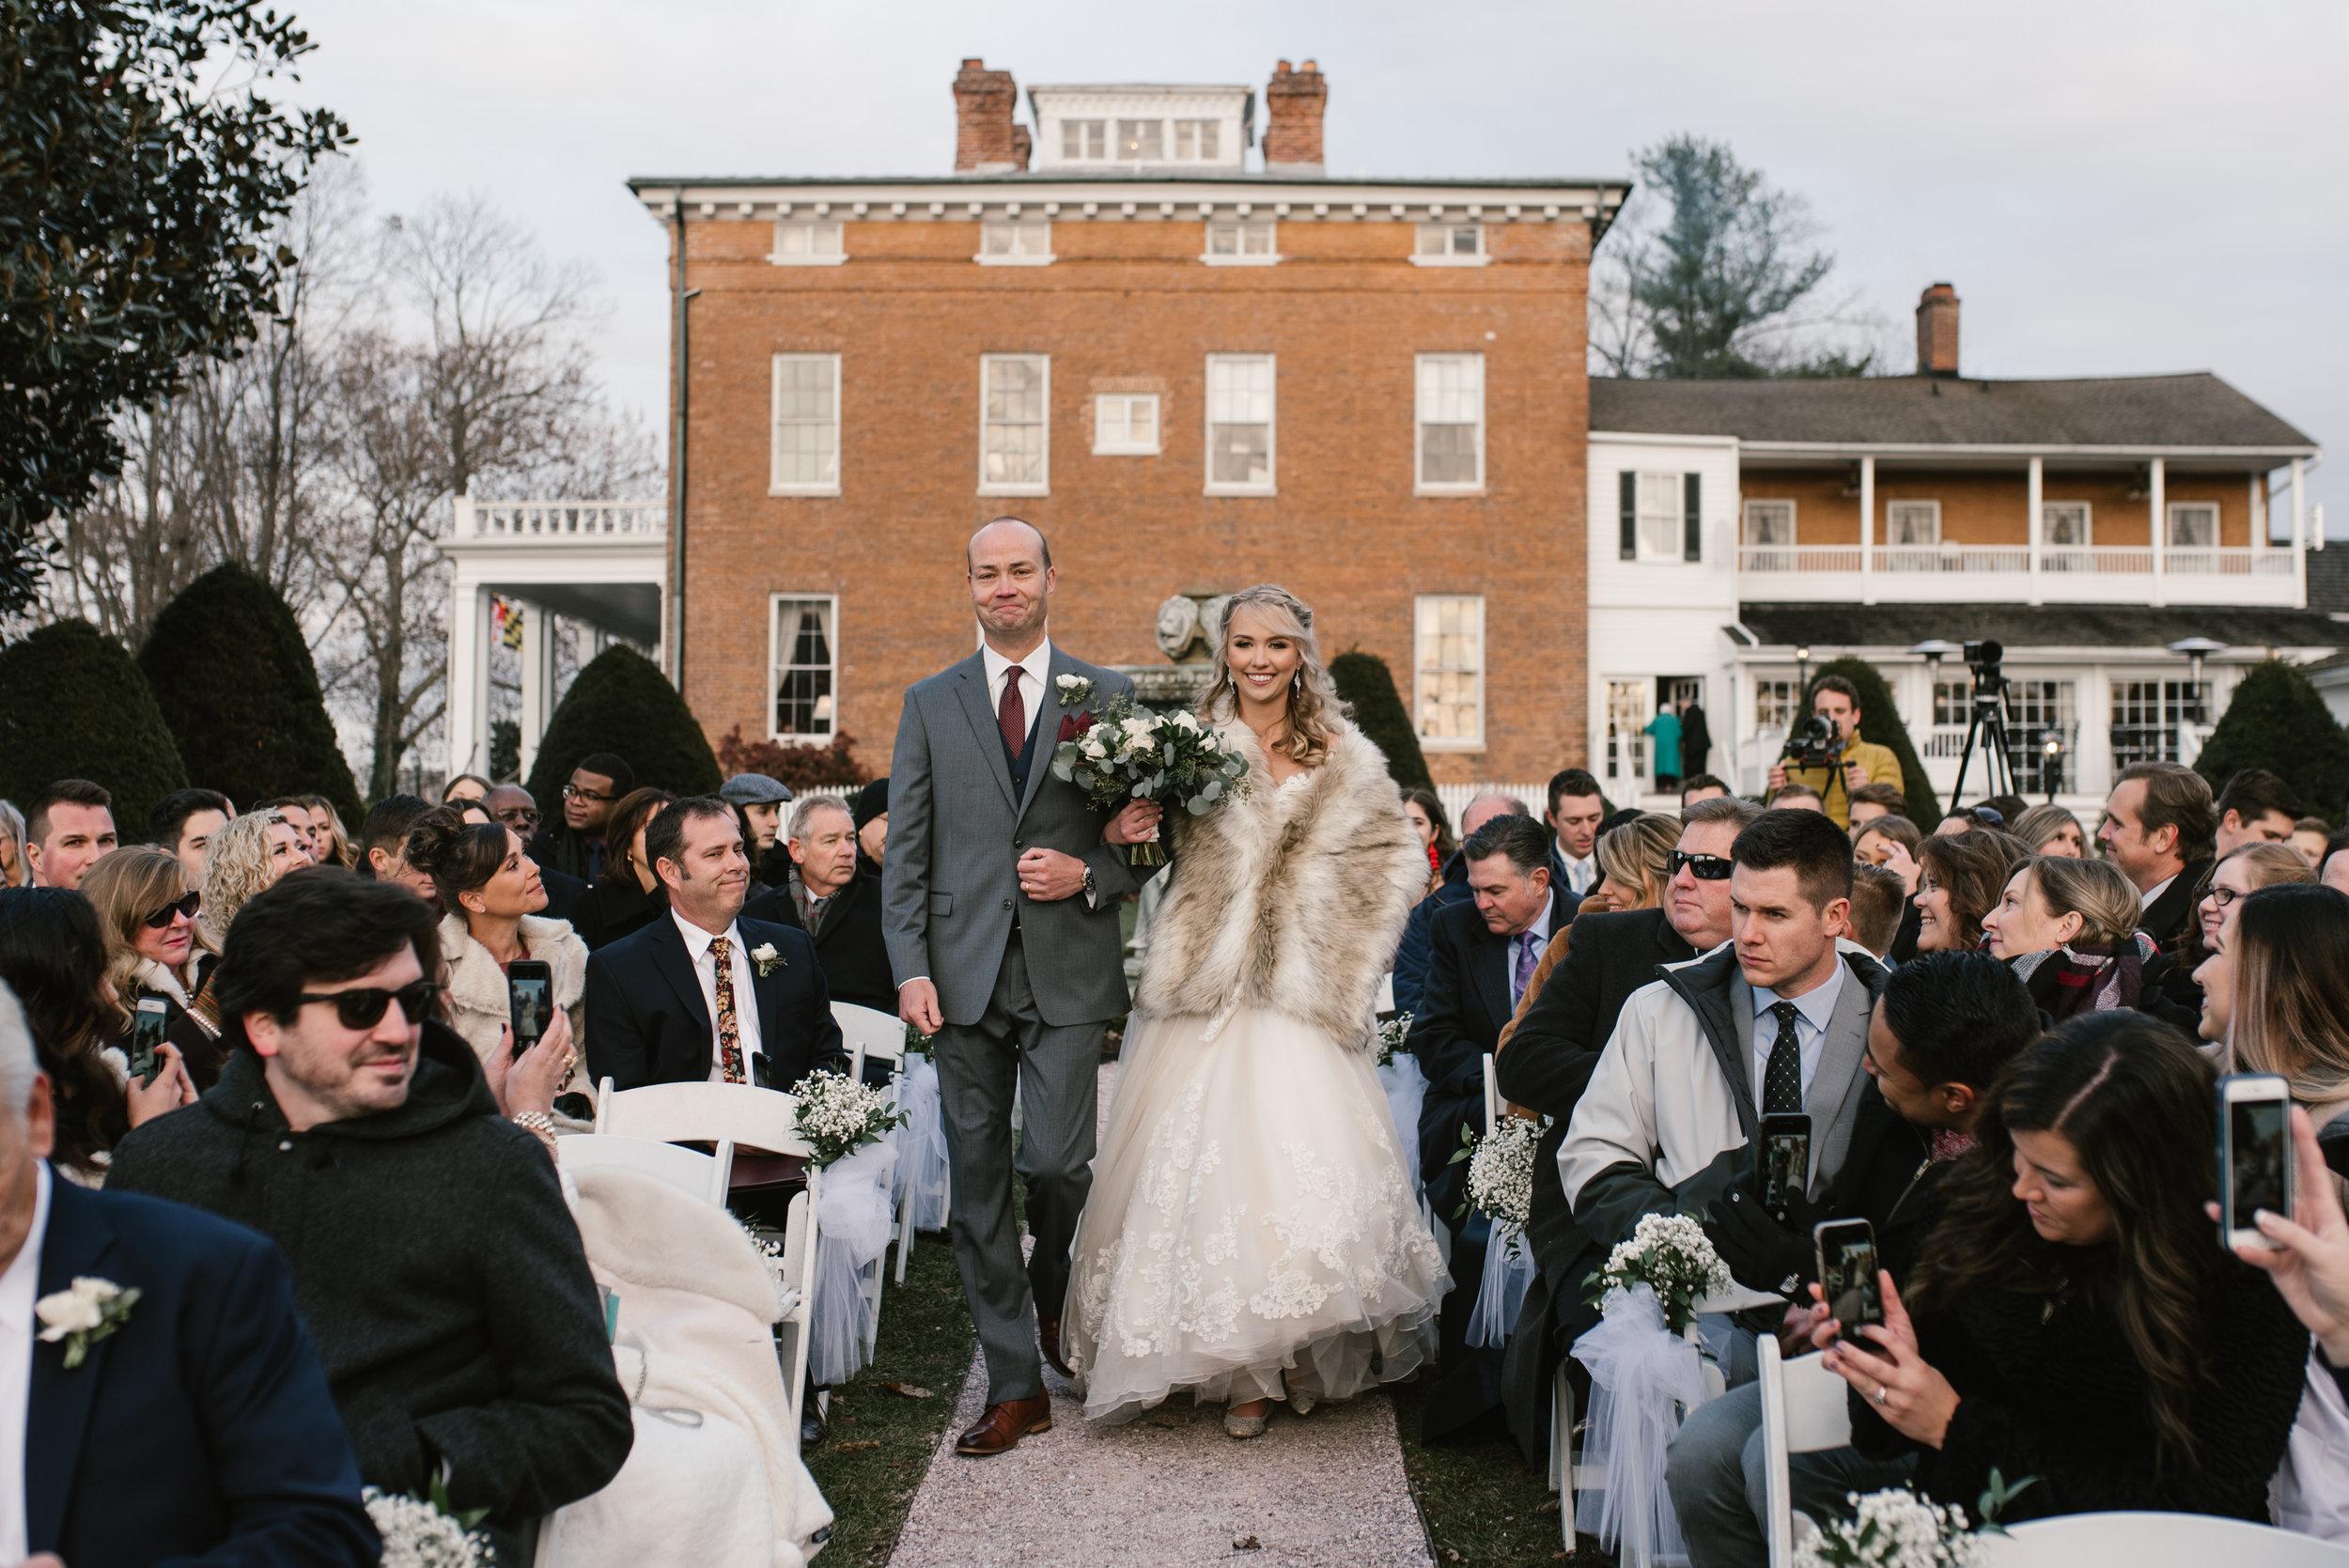 antrim-18444-spencer-wedding-1234.jpg